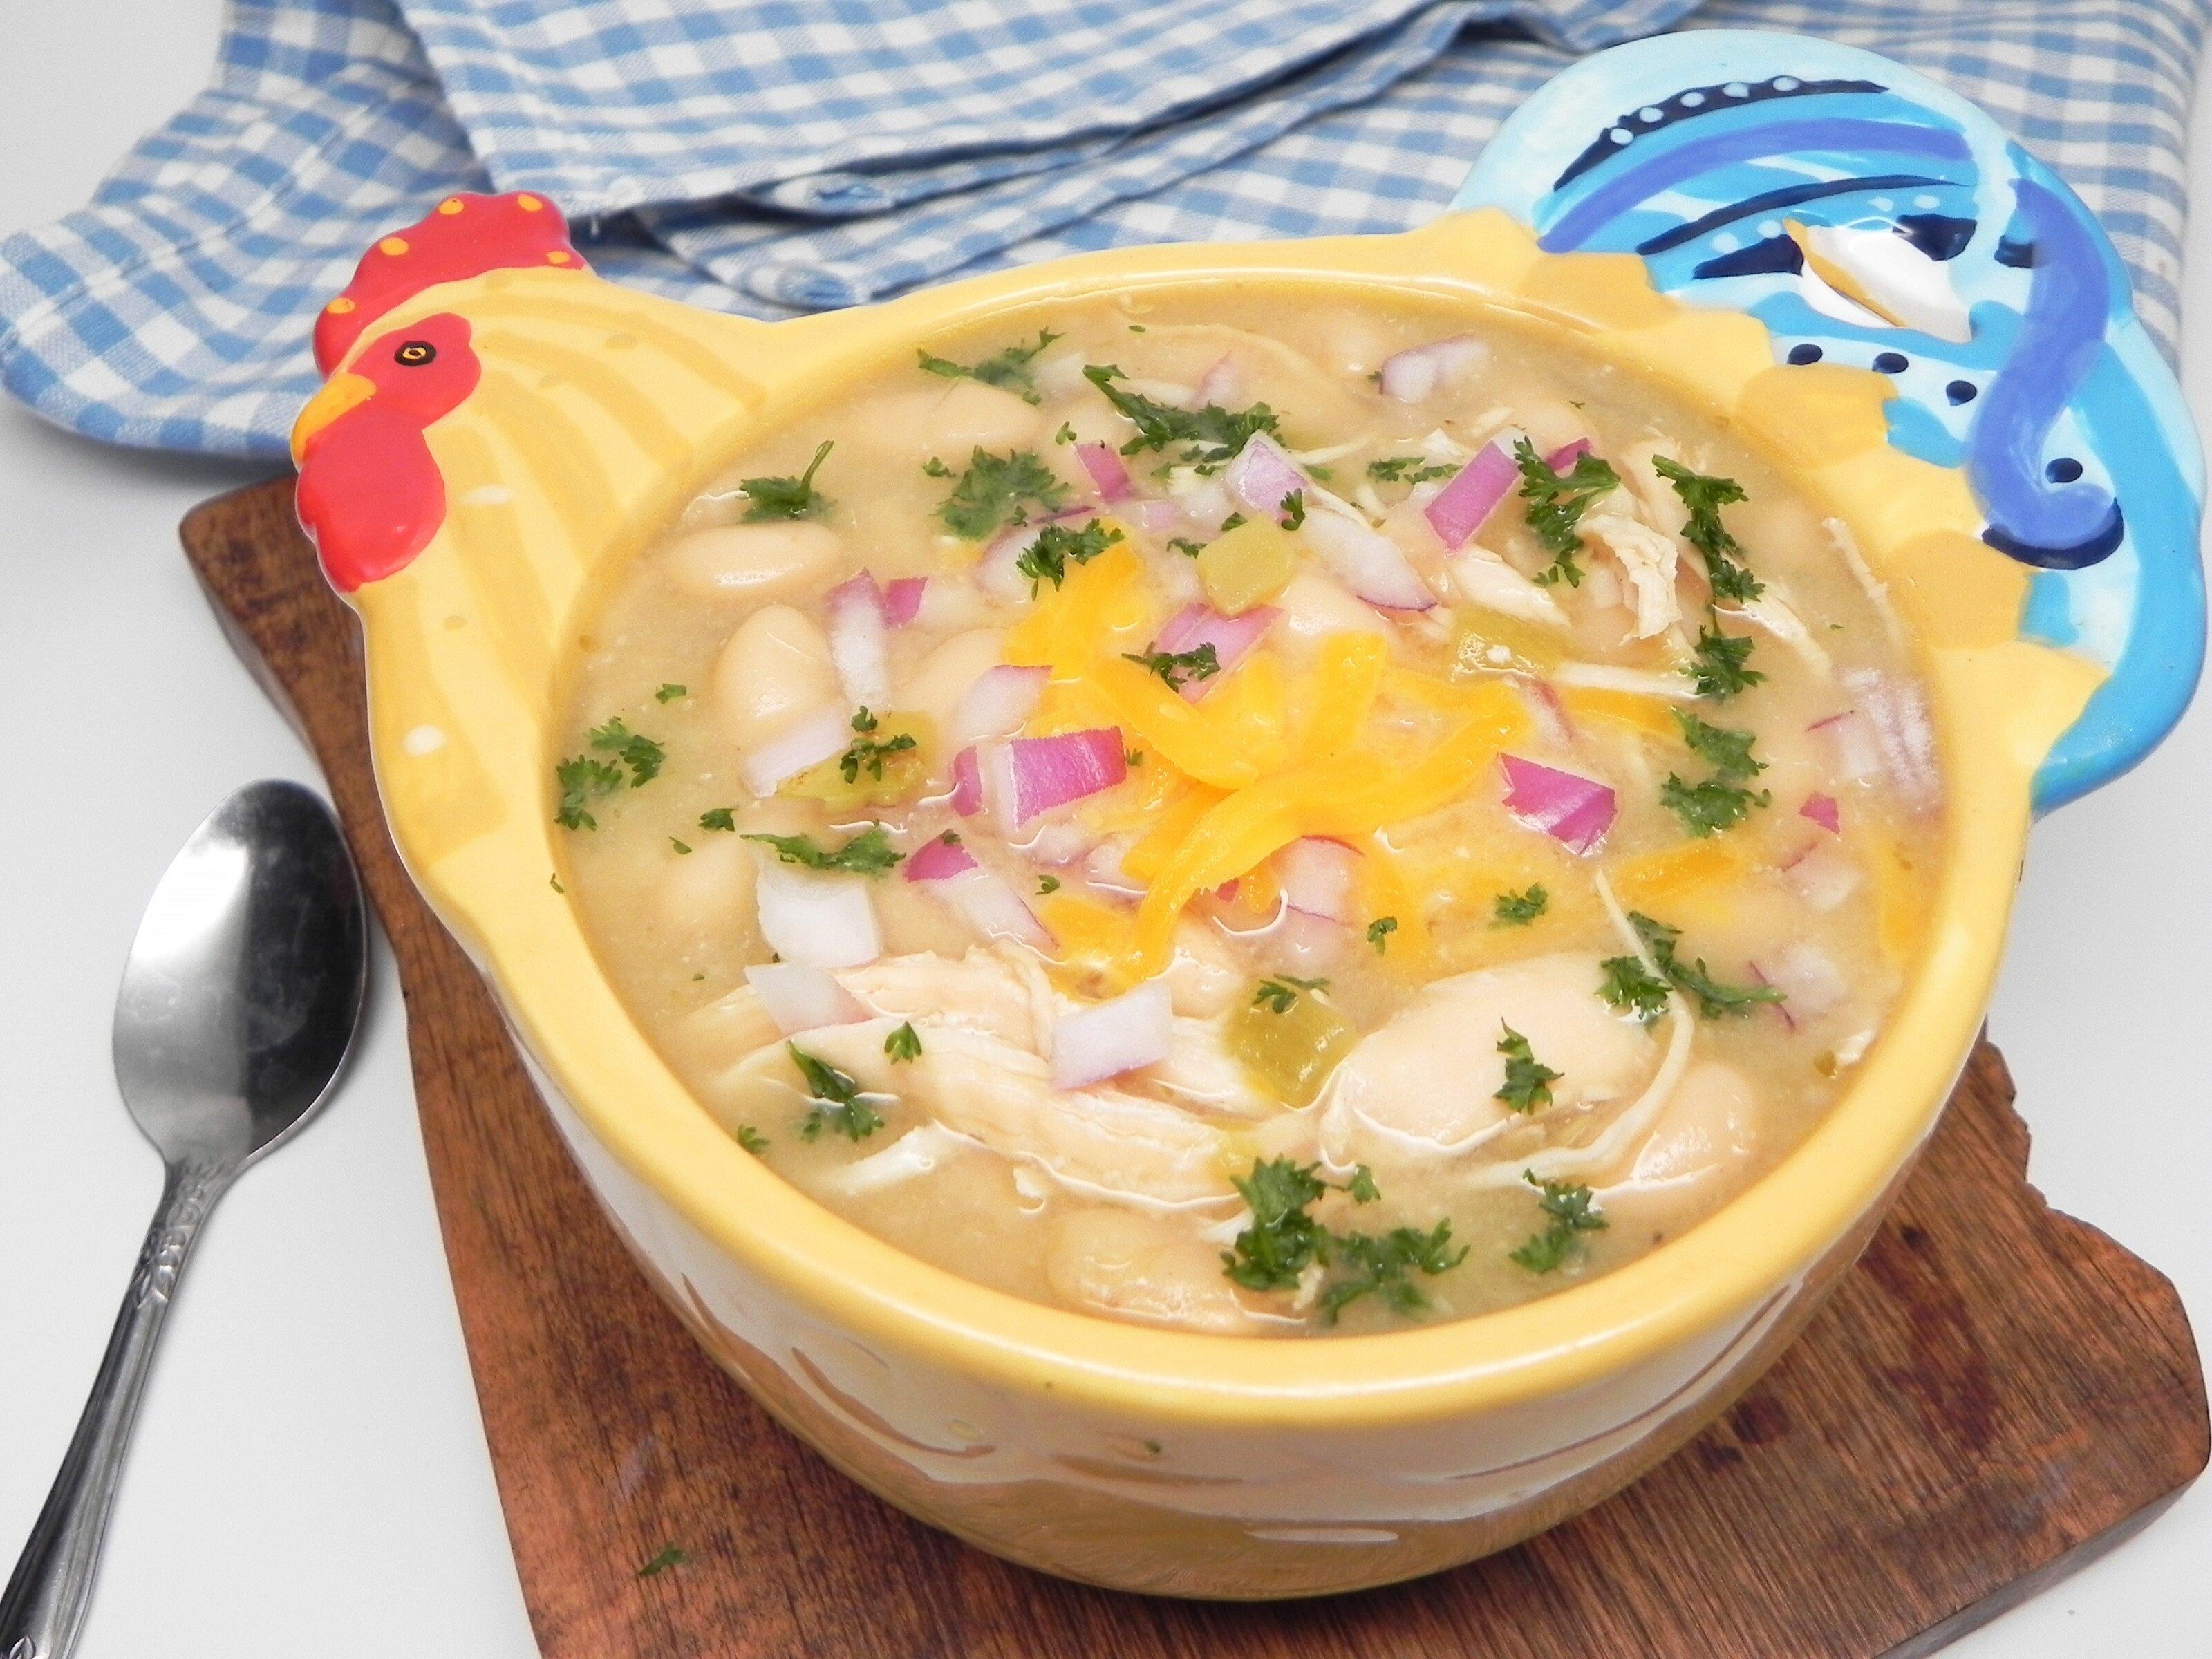 Slow Cooker Shredded Chicken Chili Allrecipes